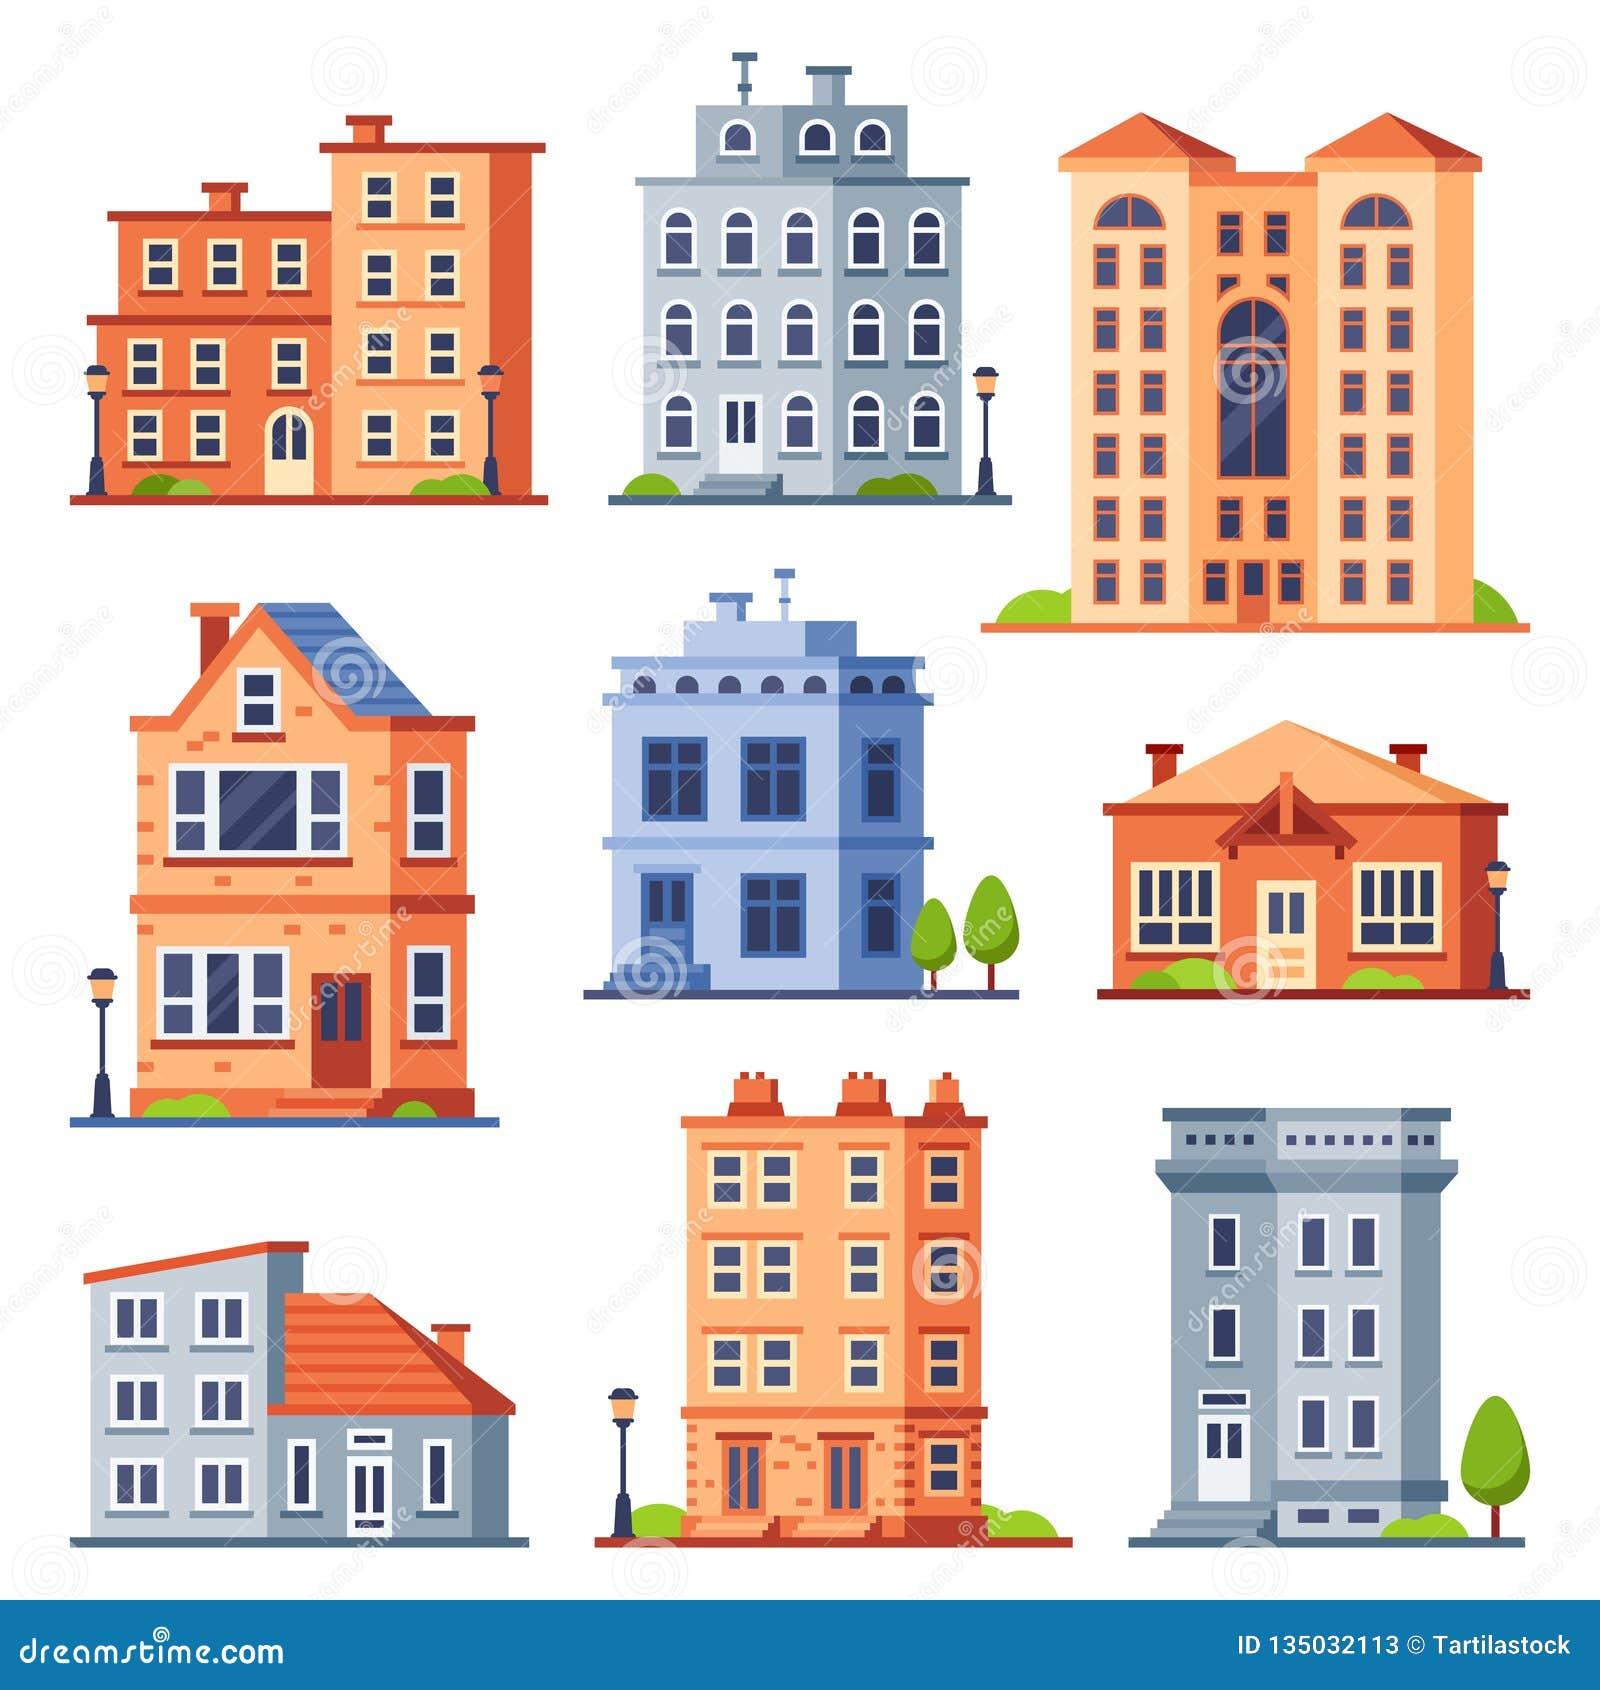 Buildings clipart apartment complex, Buildings apartment complex  Transparent FREE for download on WebStockReview 2020